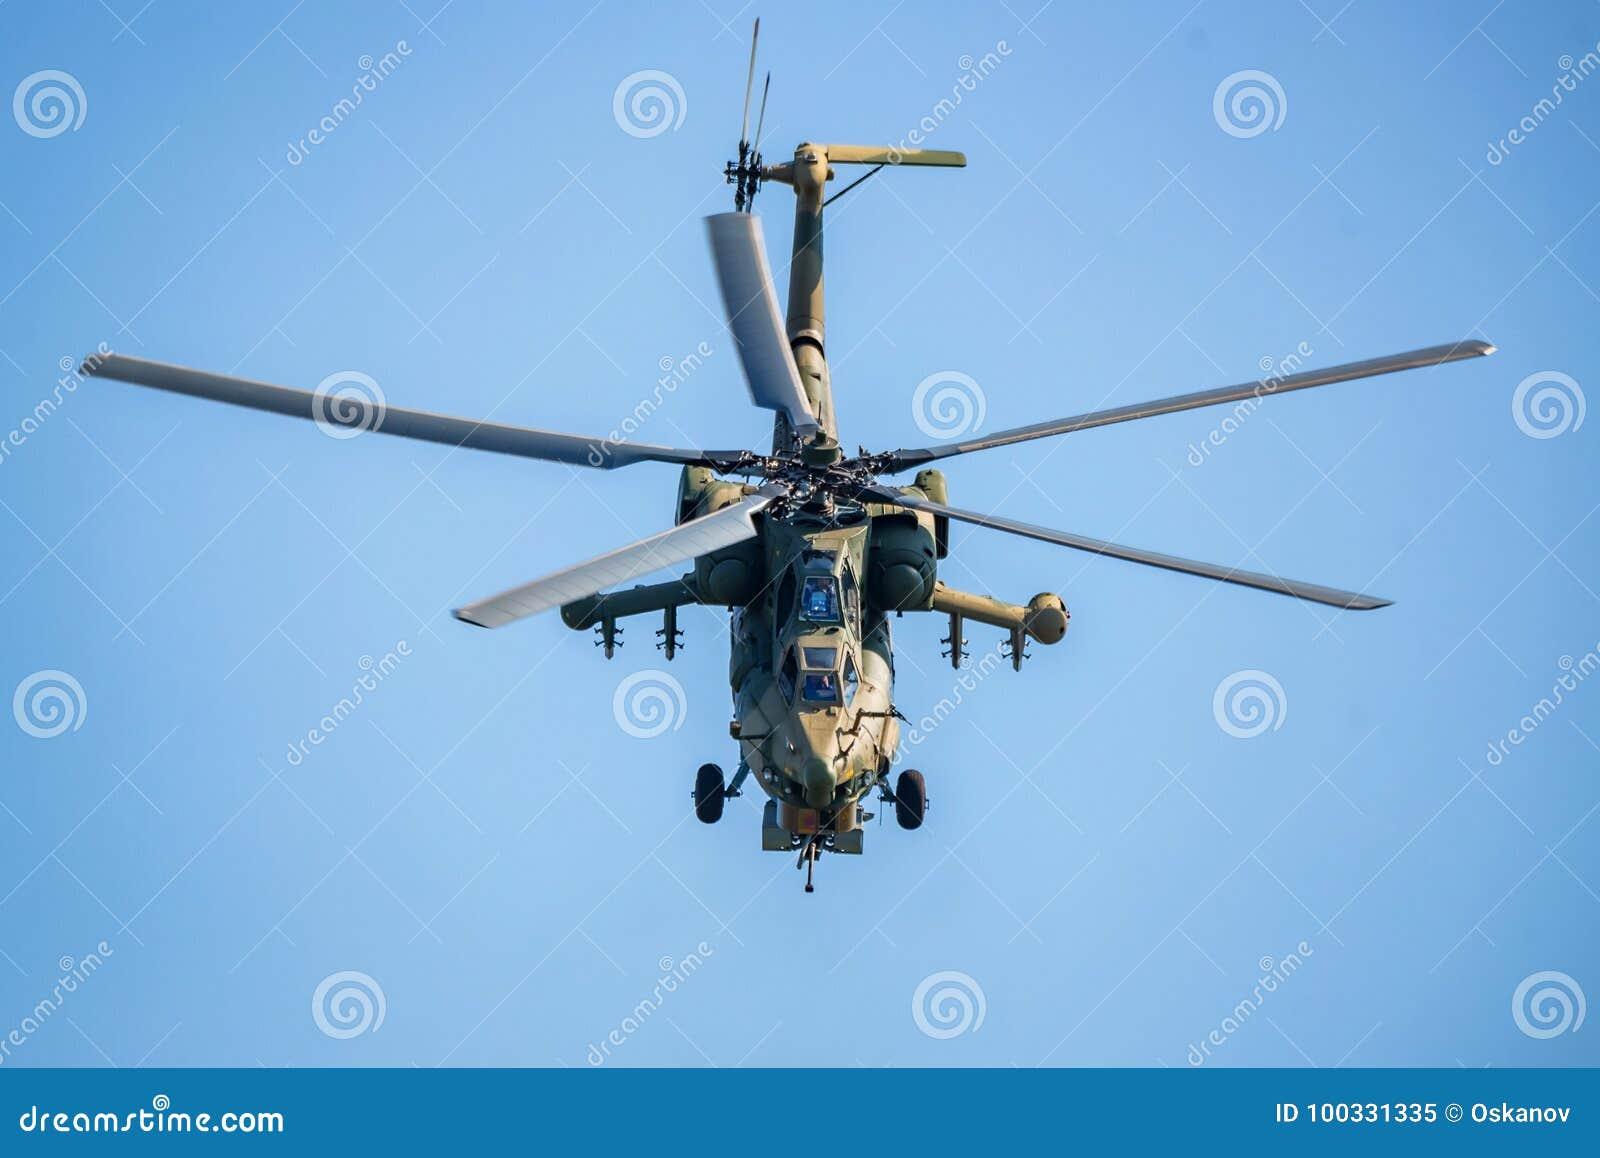 ROSTOV-ON-DON, RUSSIA - AUGUST, 2017: Mi-28 Havoc